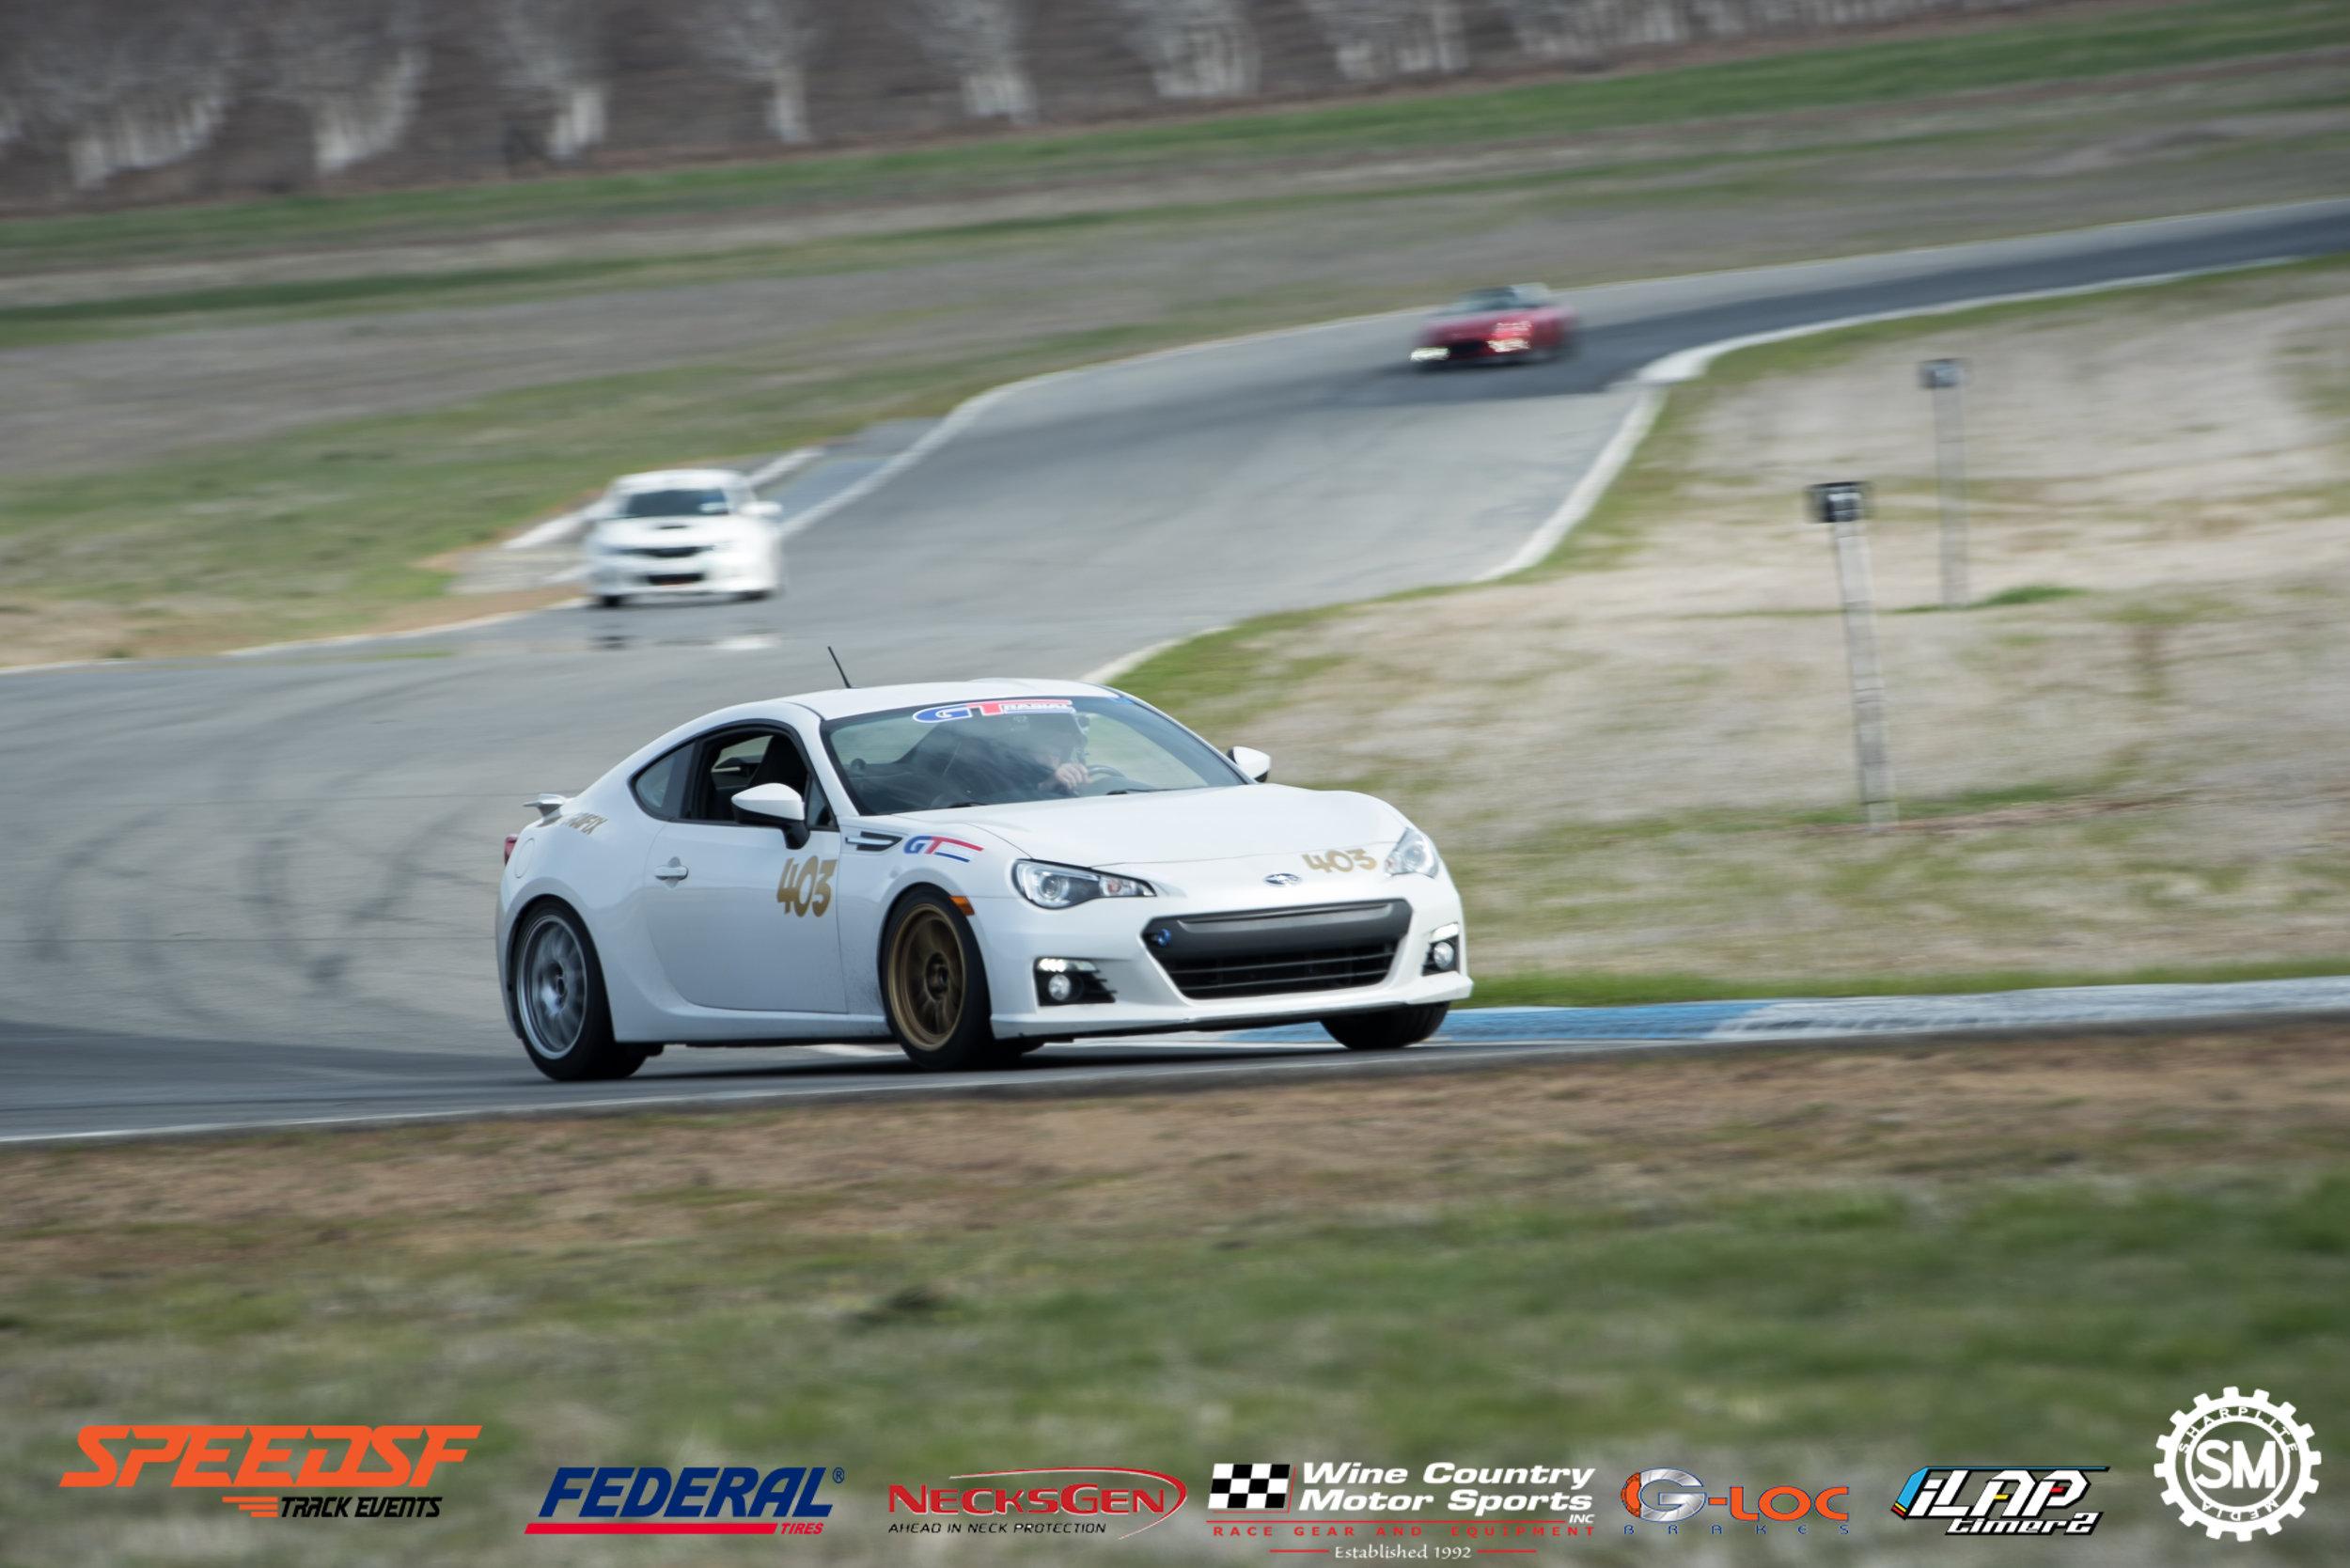 speedsf track saturday-426.jpg